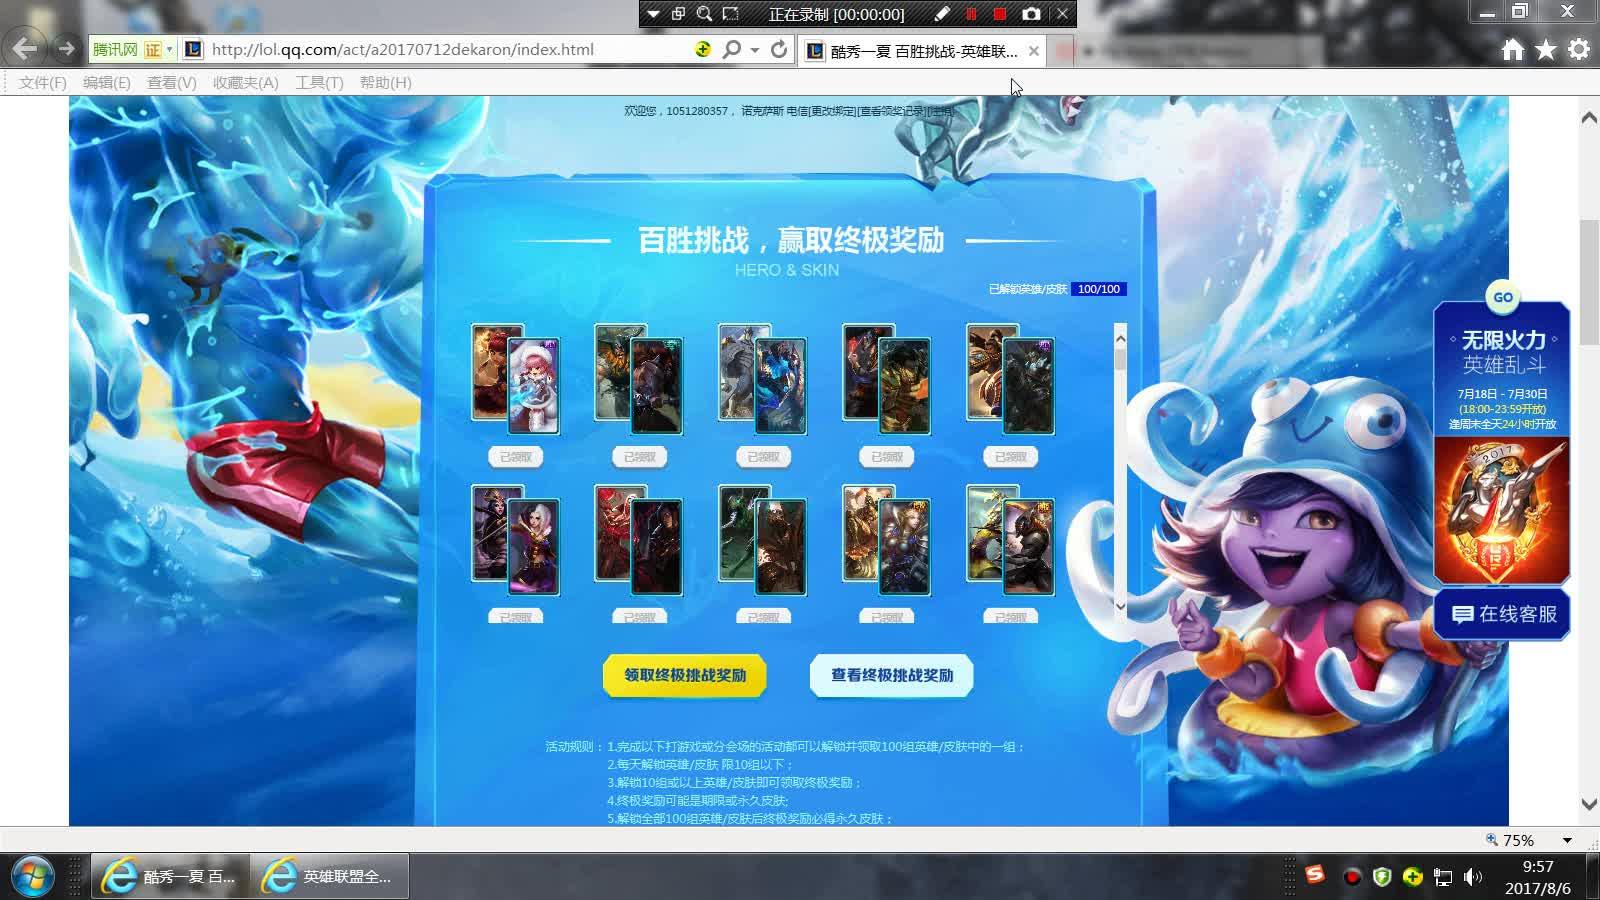 【never磊】终于打了100胜场,来看看英雄联盟夏日百胜挑战活动能开出